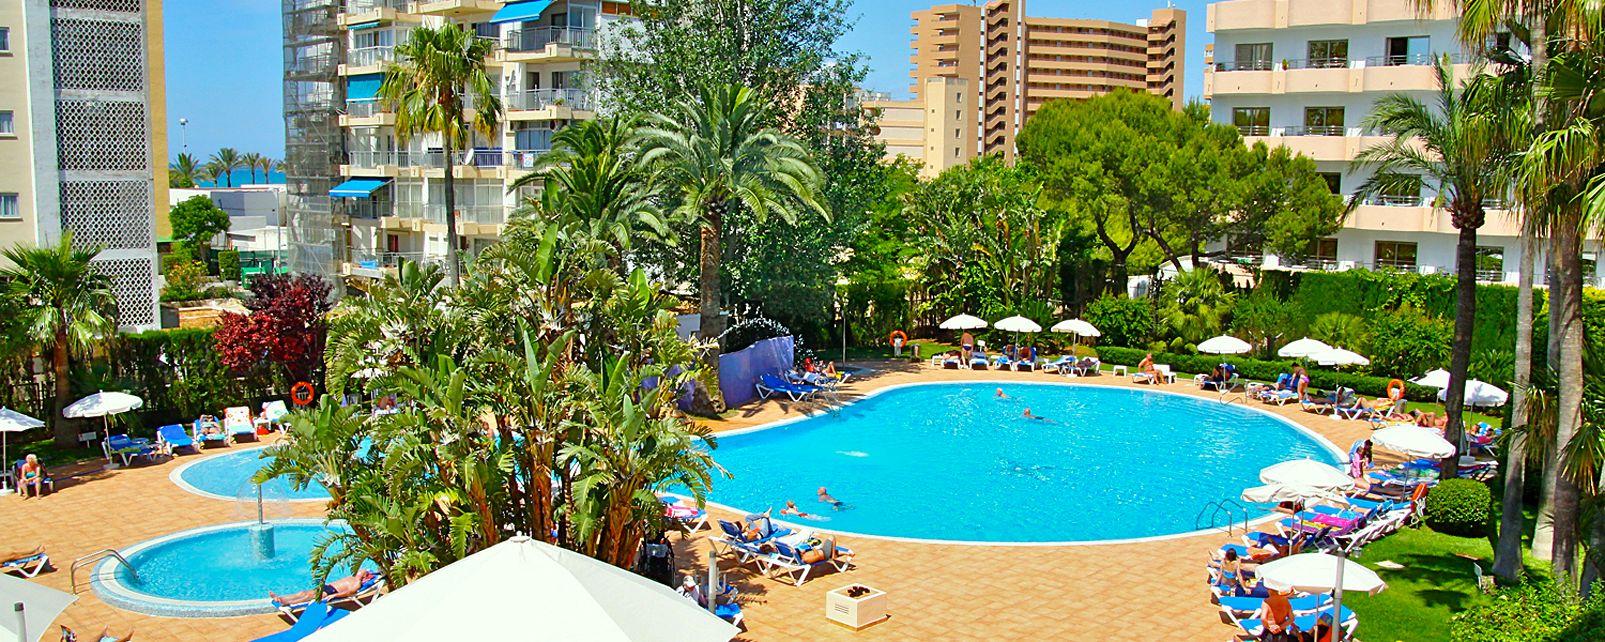 Mallorca Hotel Oleander Playa De Palma